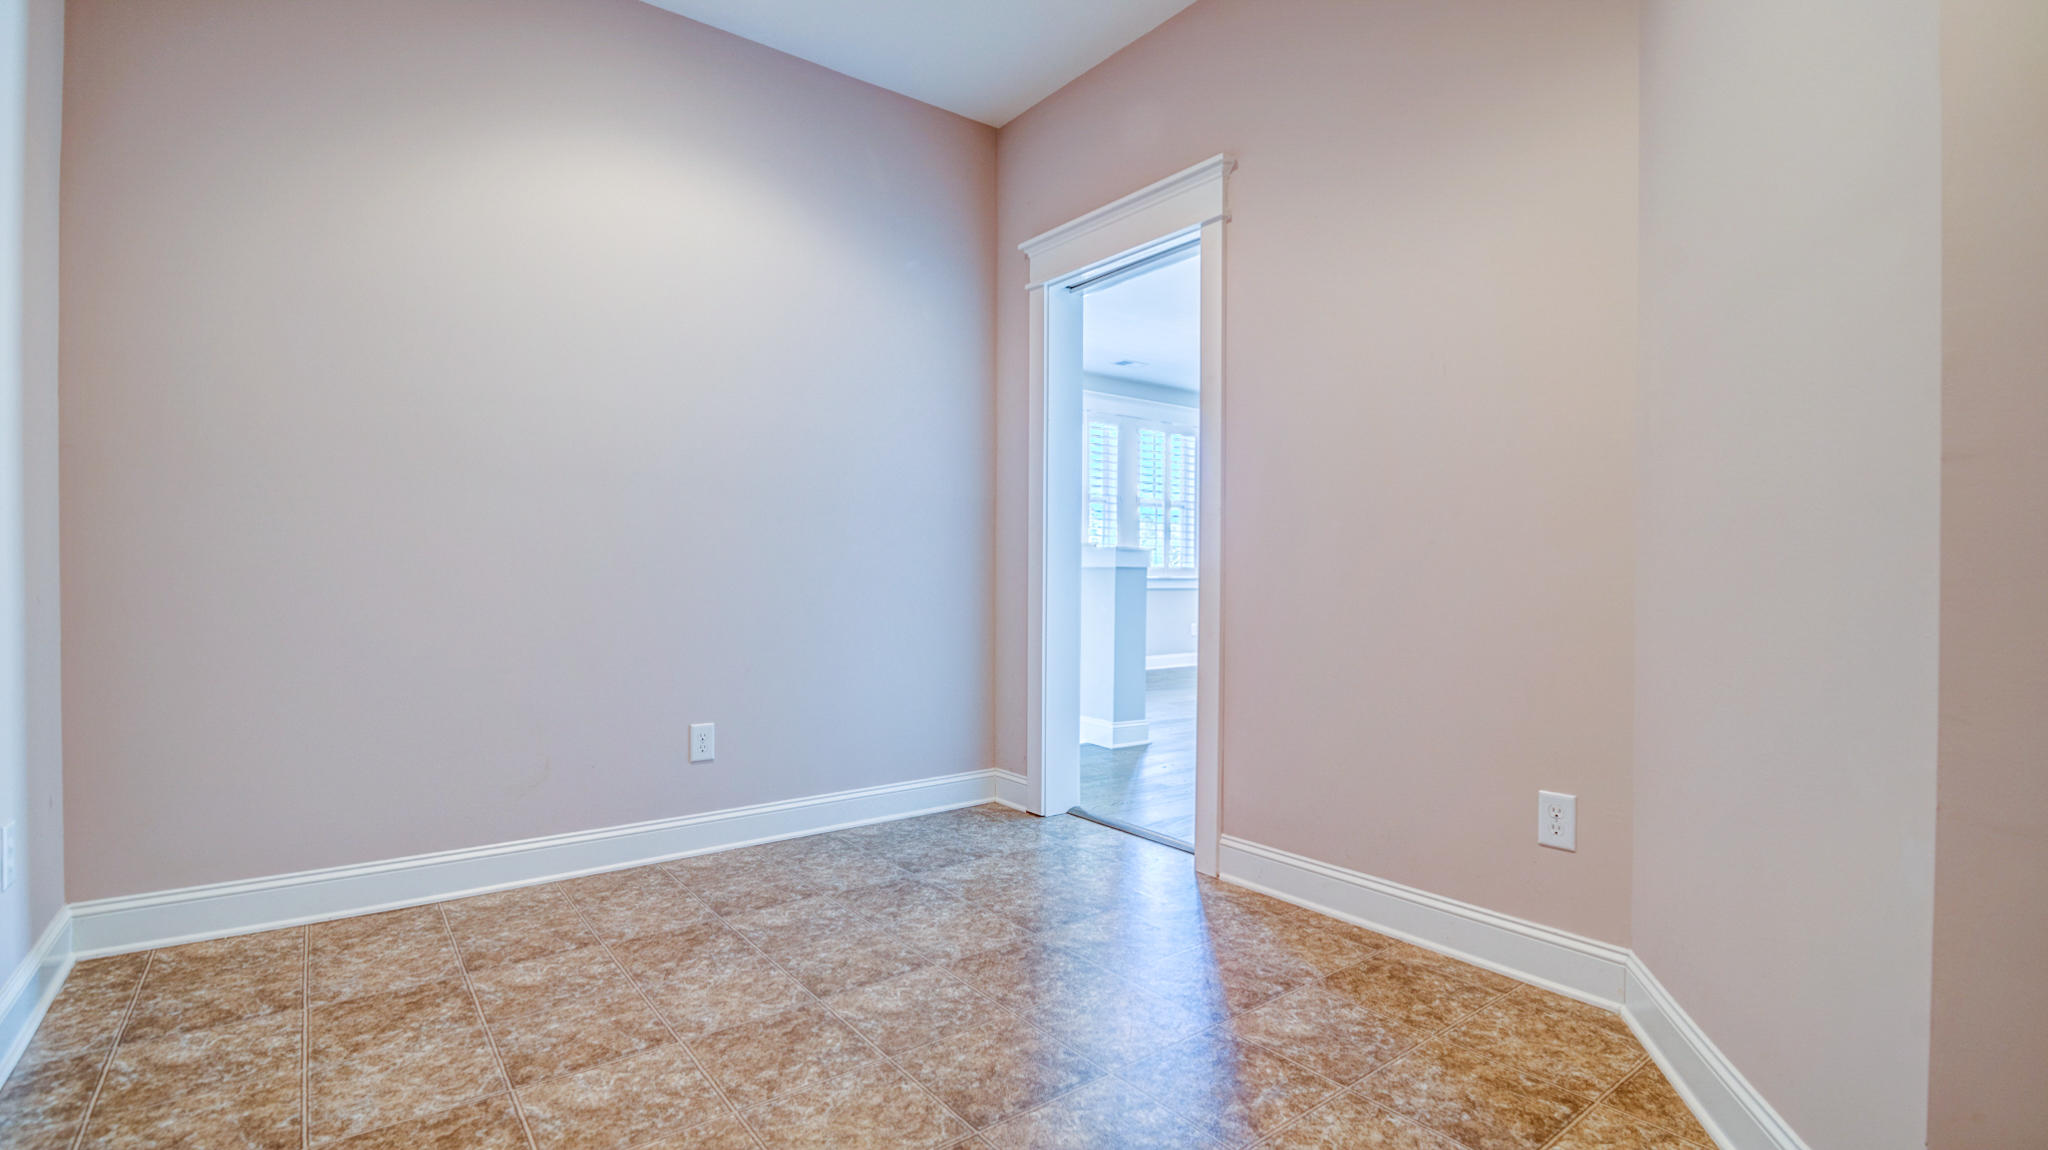 Carolina Park Homes For Sale - 3687 Spindrift, Mount Pleasant, SC - 30